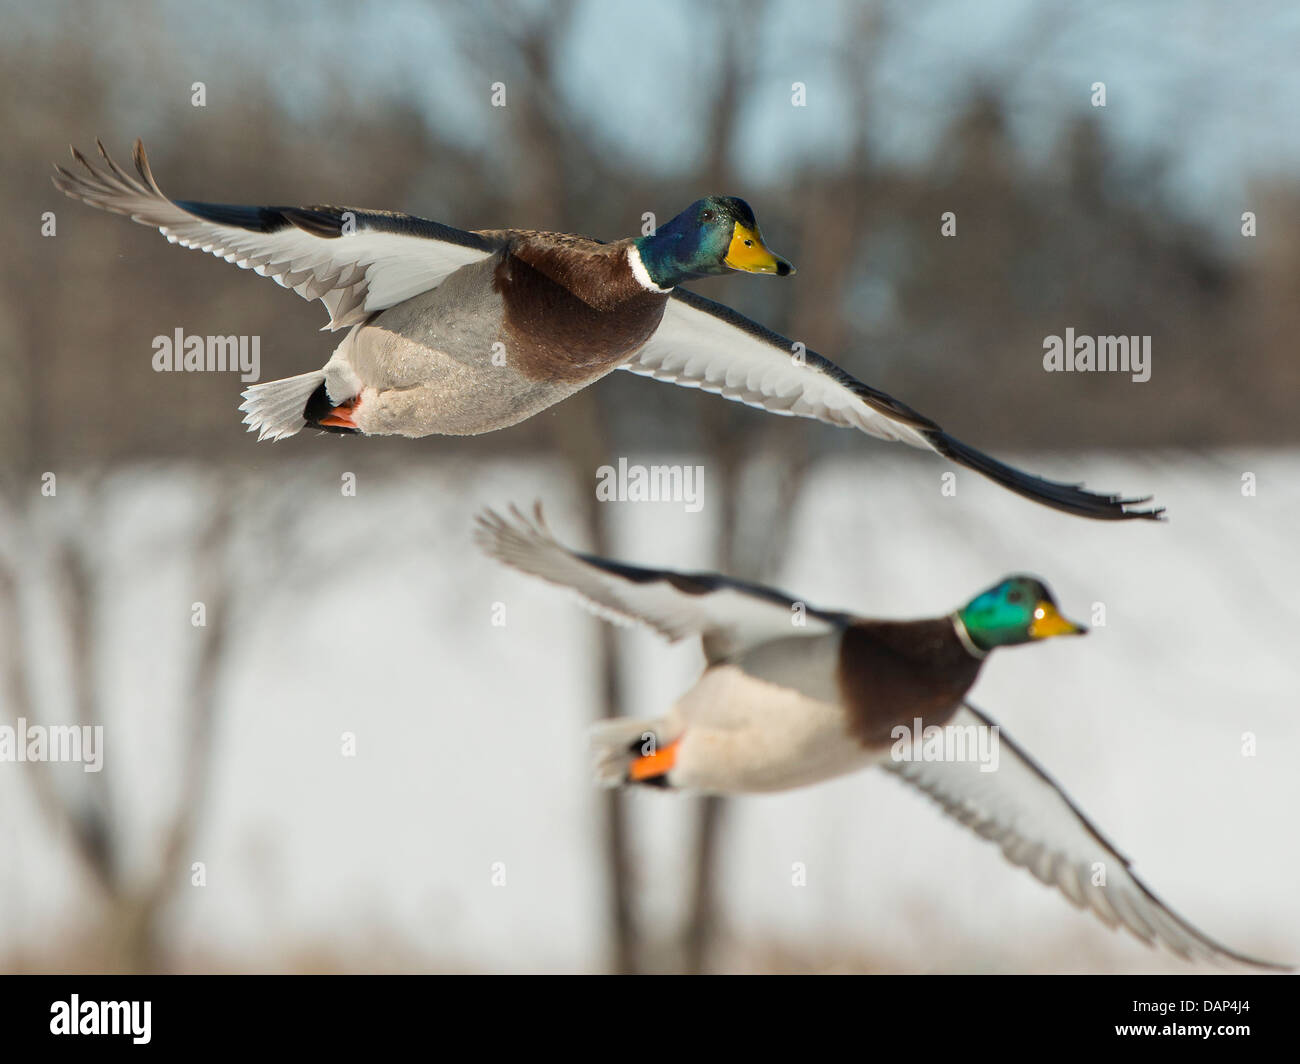 Flying Mallard Ducks - Stock Image